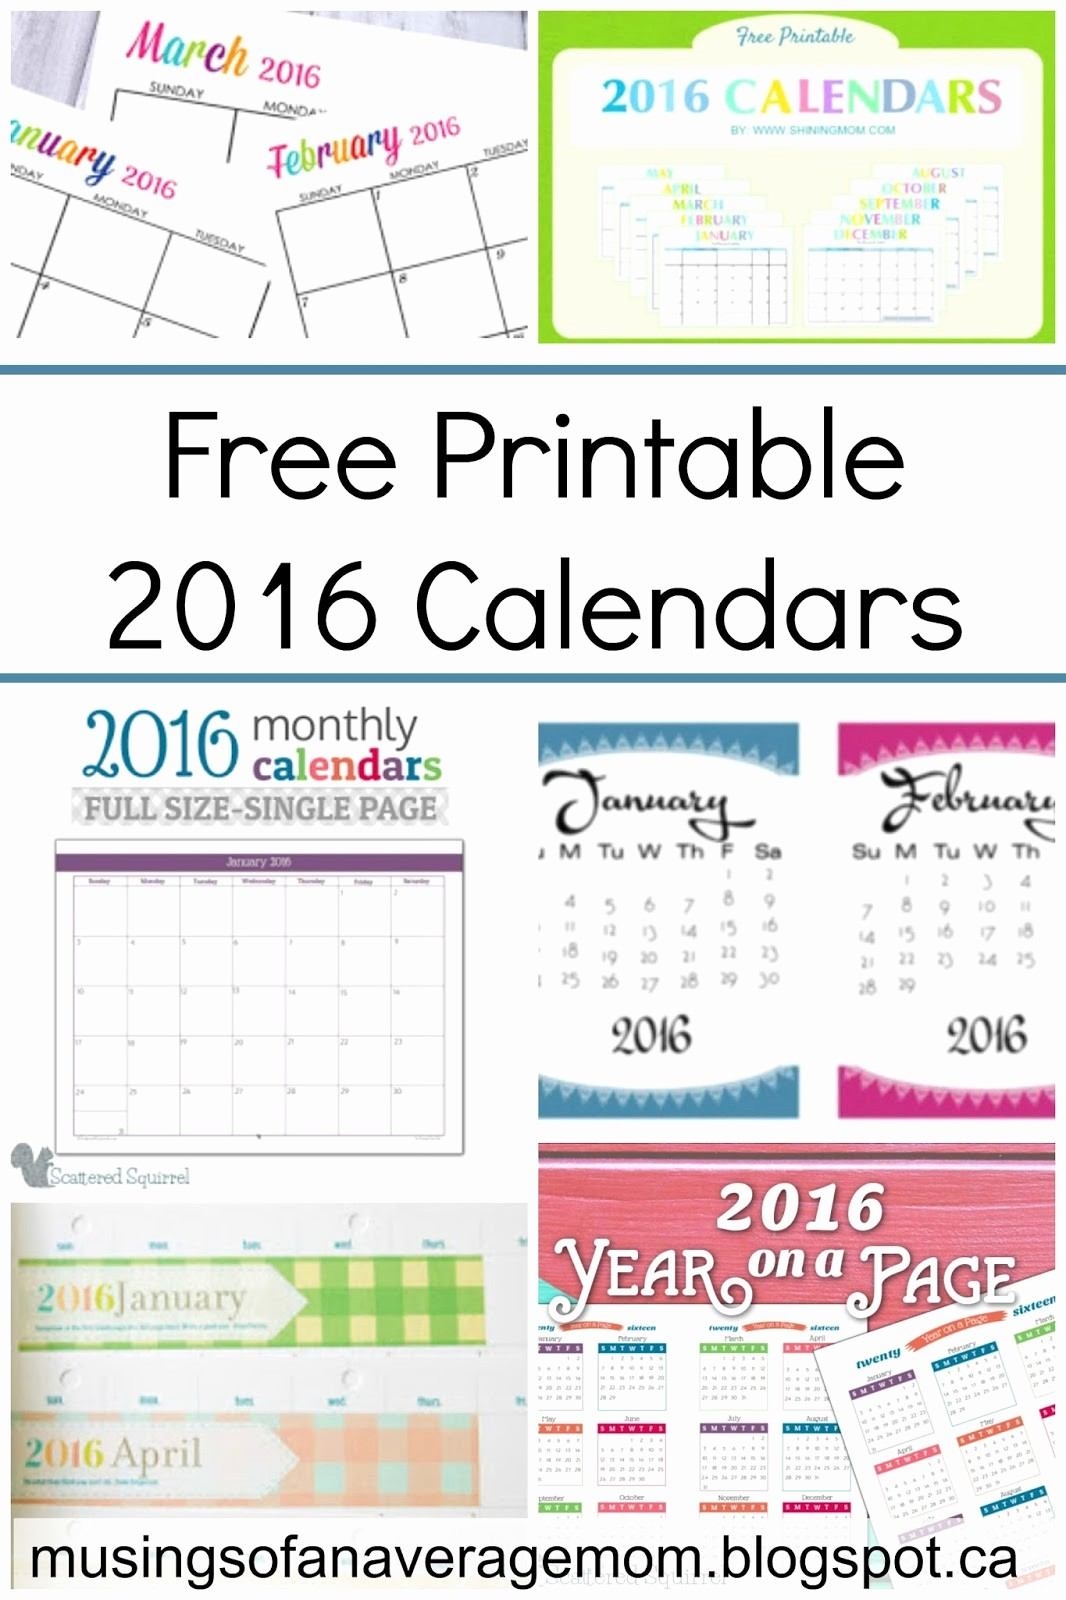 Monthly Calendar 2016 Printable Free Fresh Musings Of An Average Mom Free Printable 2016 Calendar